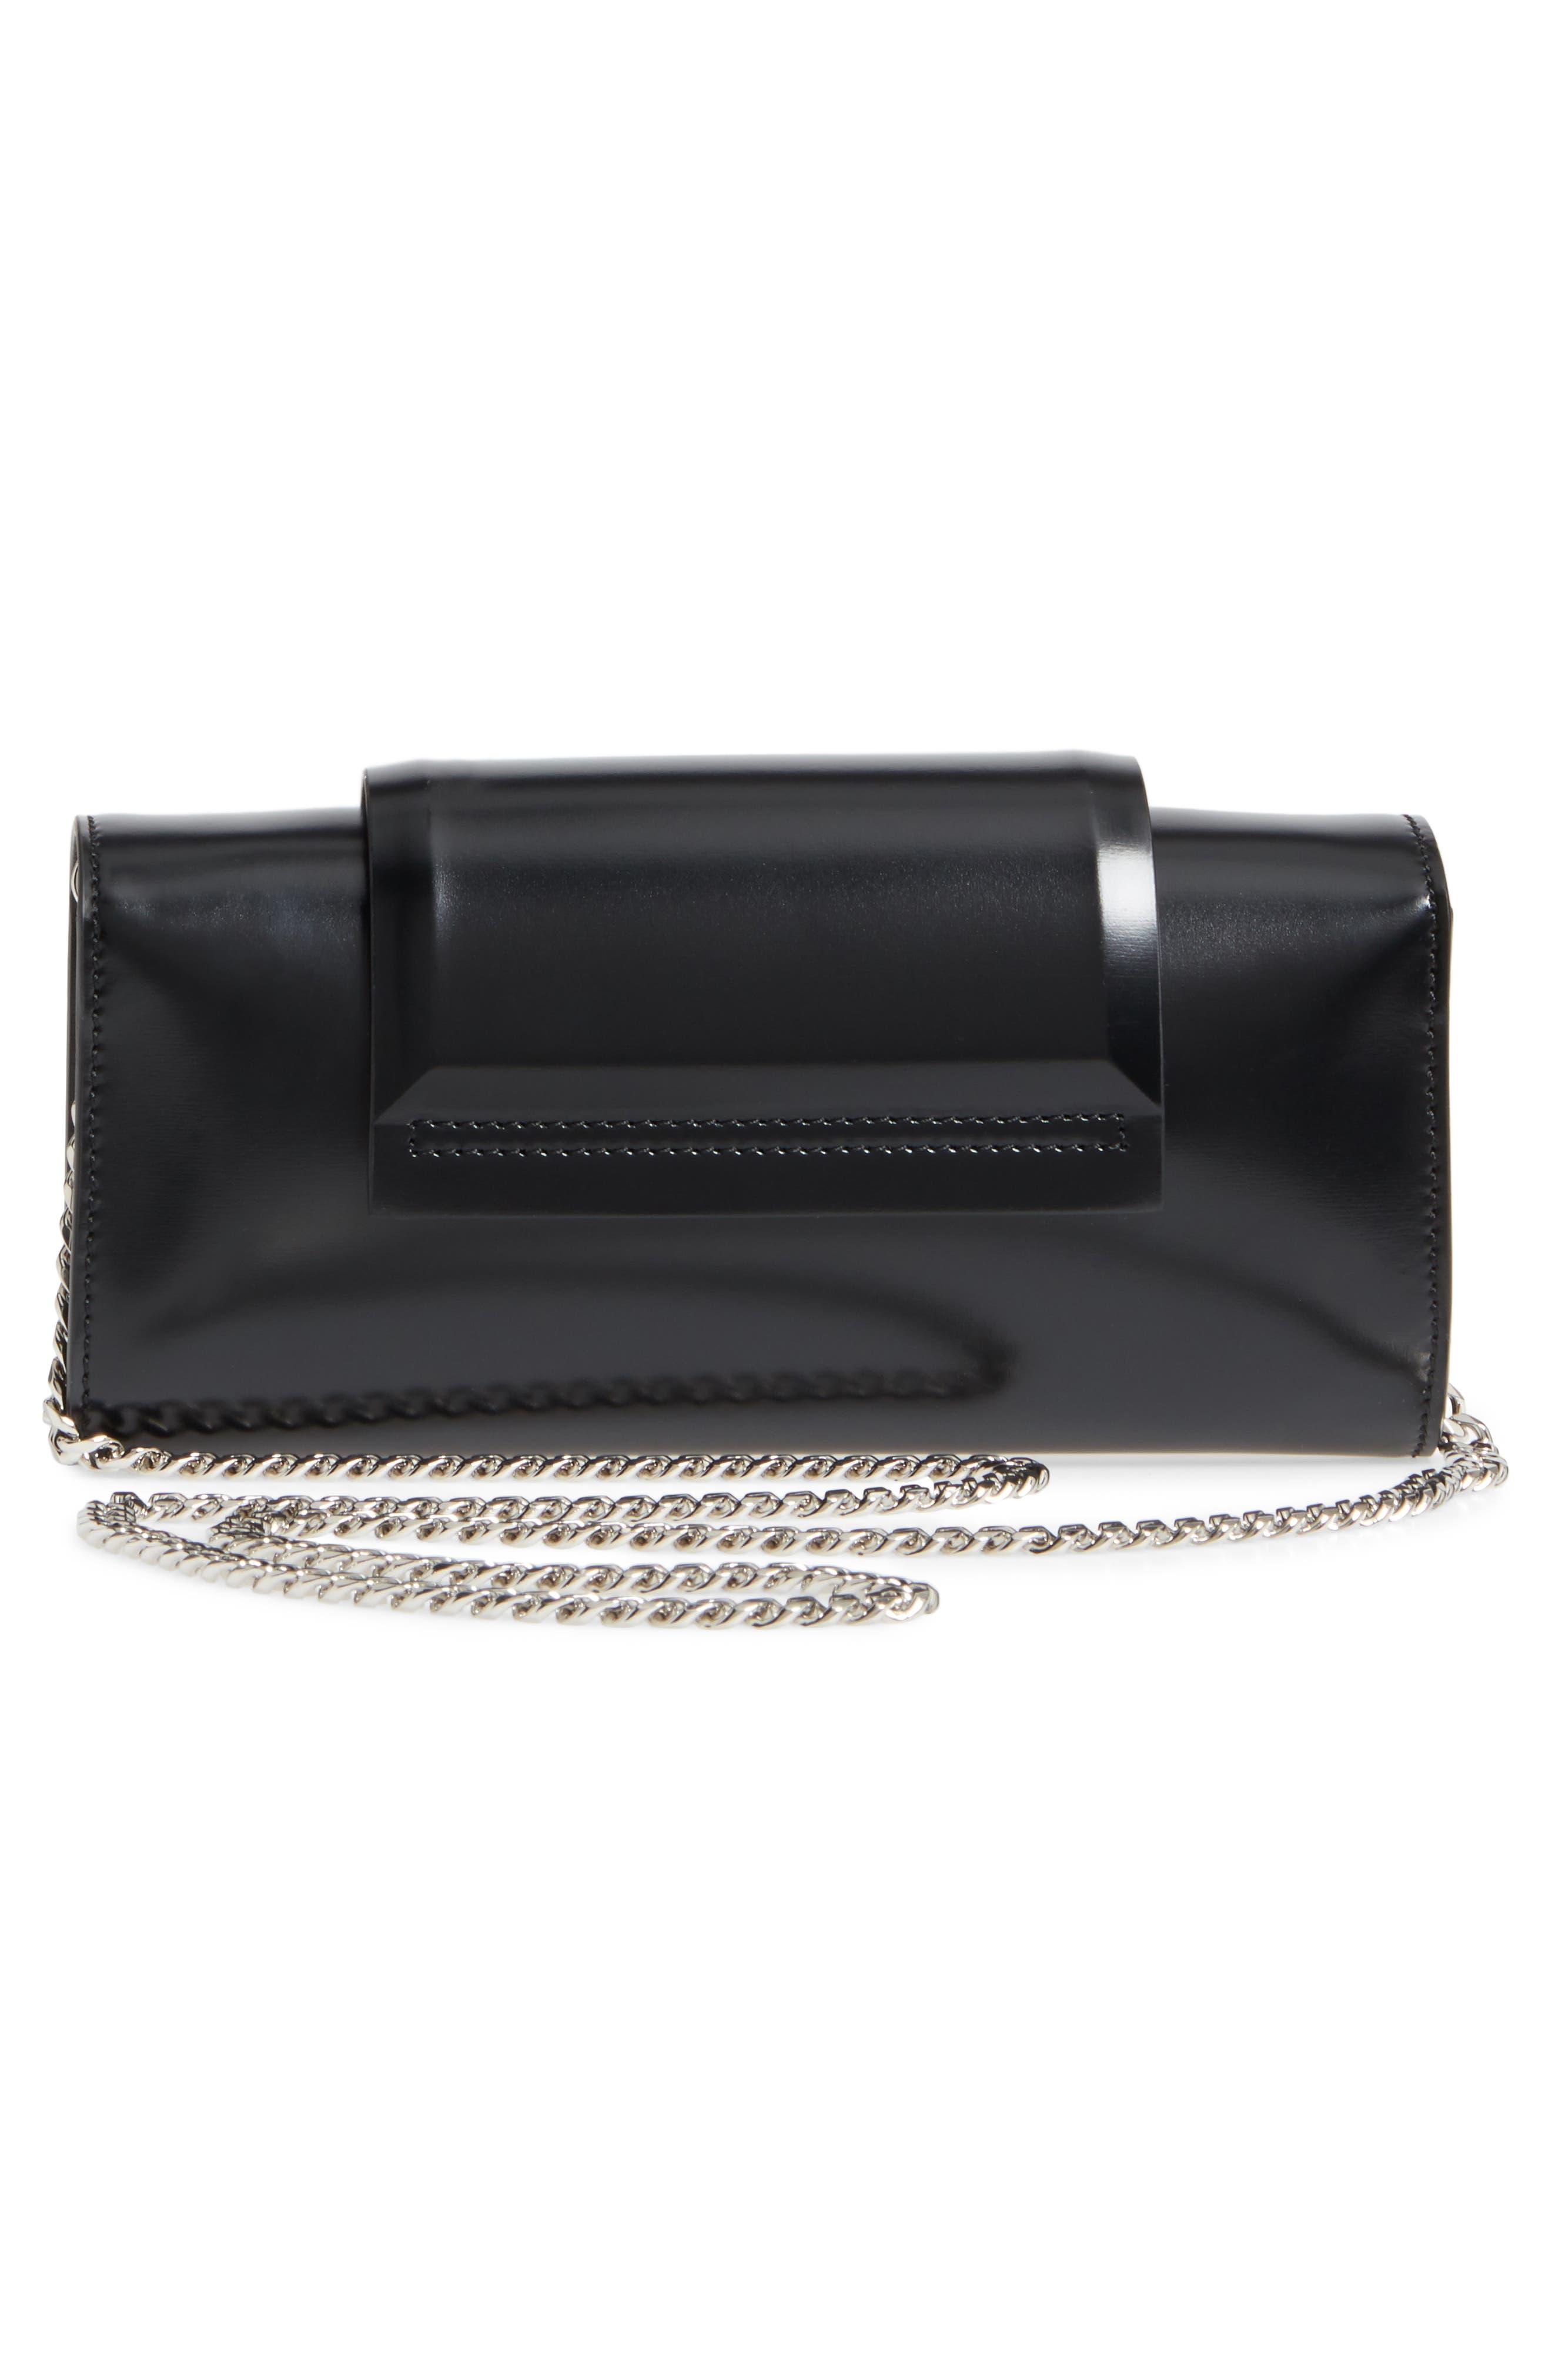 Mini Infinity Calfskin Leather Shoulder/Crossbody Bag,                             Alternate thumbnail 5, color,